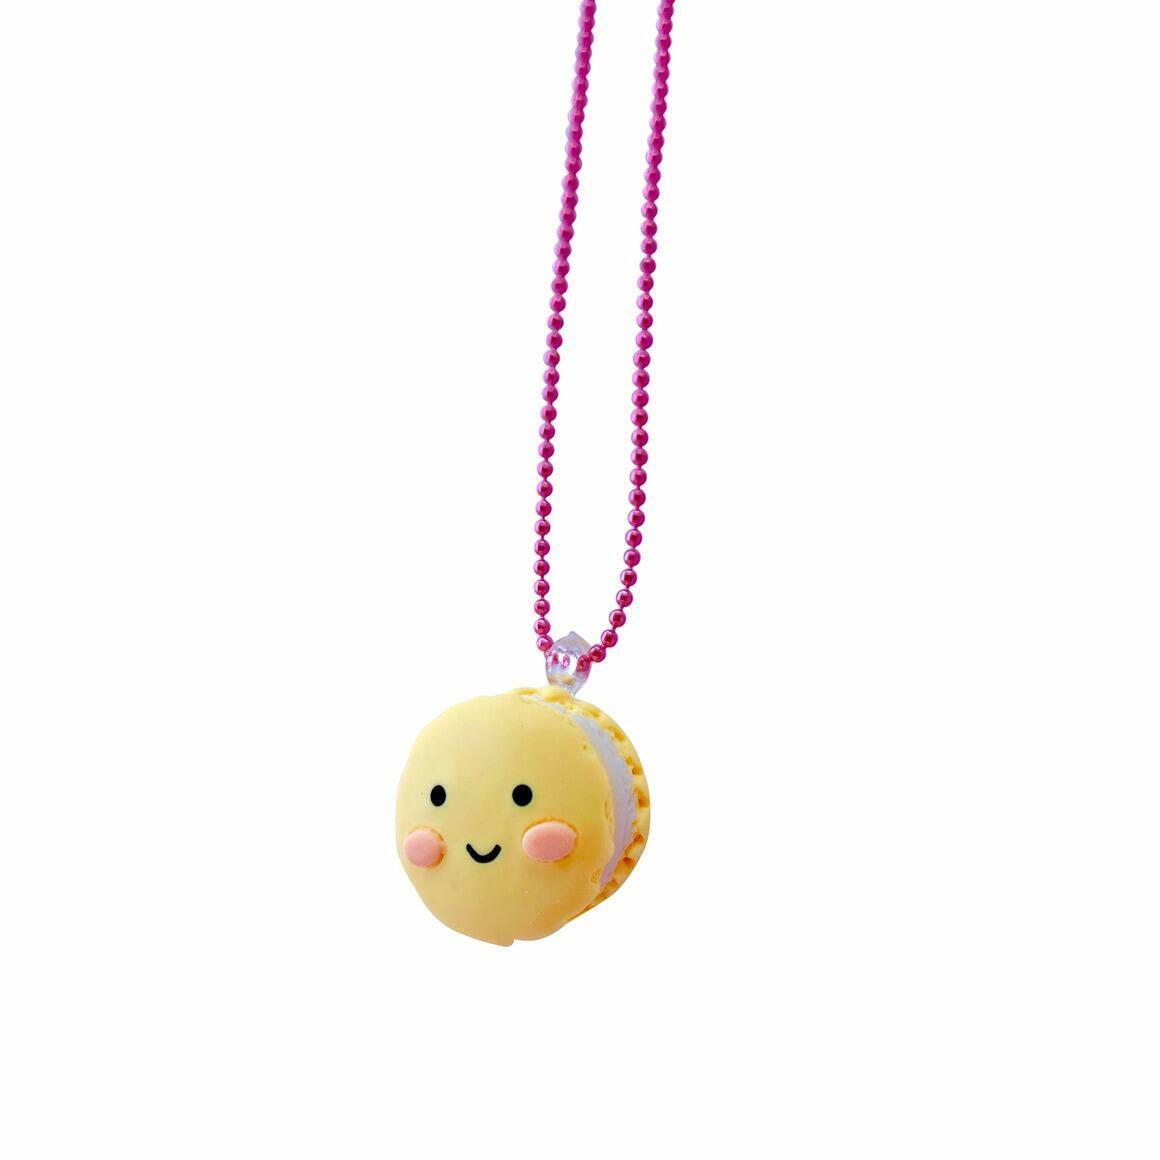 Ltd. Pop Cutie Smiley Macaroon Kids Necklaces - 6 pcs. | Trada Marketplace